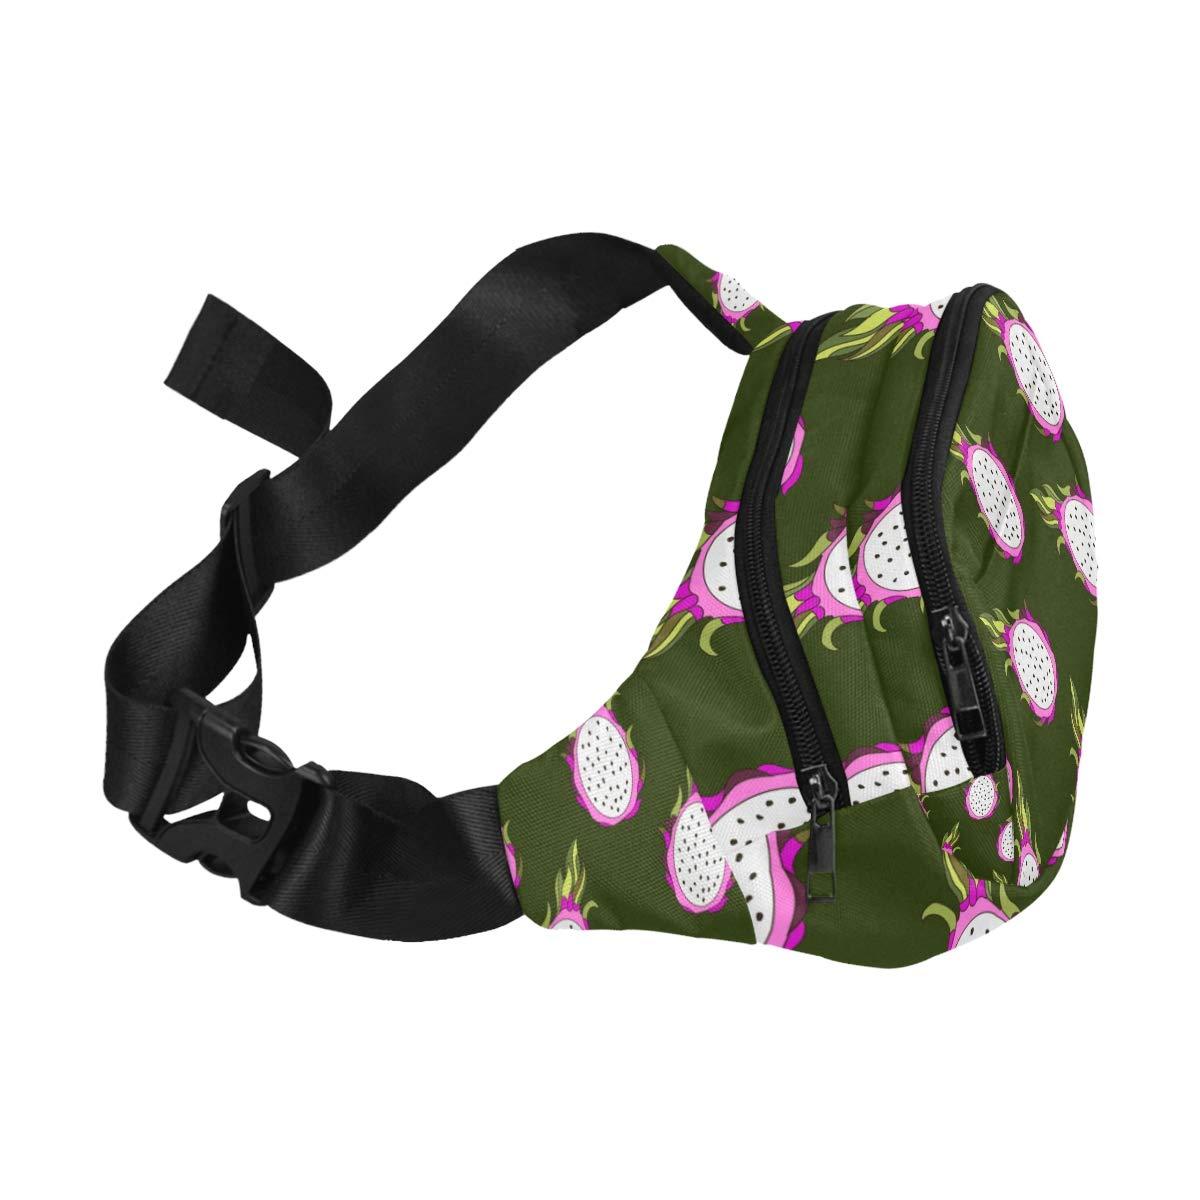 Tropical Exotic Fruit Dragon Fruit Fenny Packs Waist Bags Adjustable Belt Waterproof Nylon Travel Running Sport Vacation Party For Men Women Boys Girls Kids